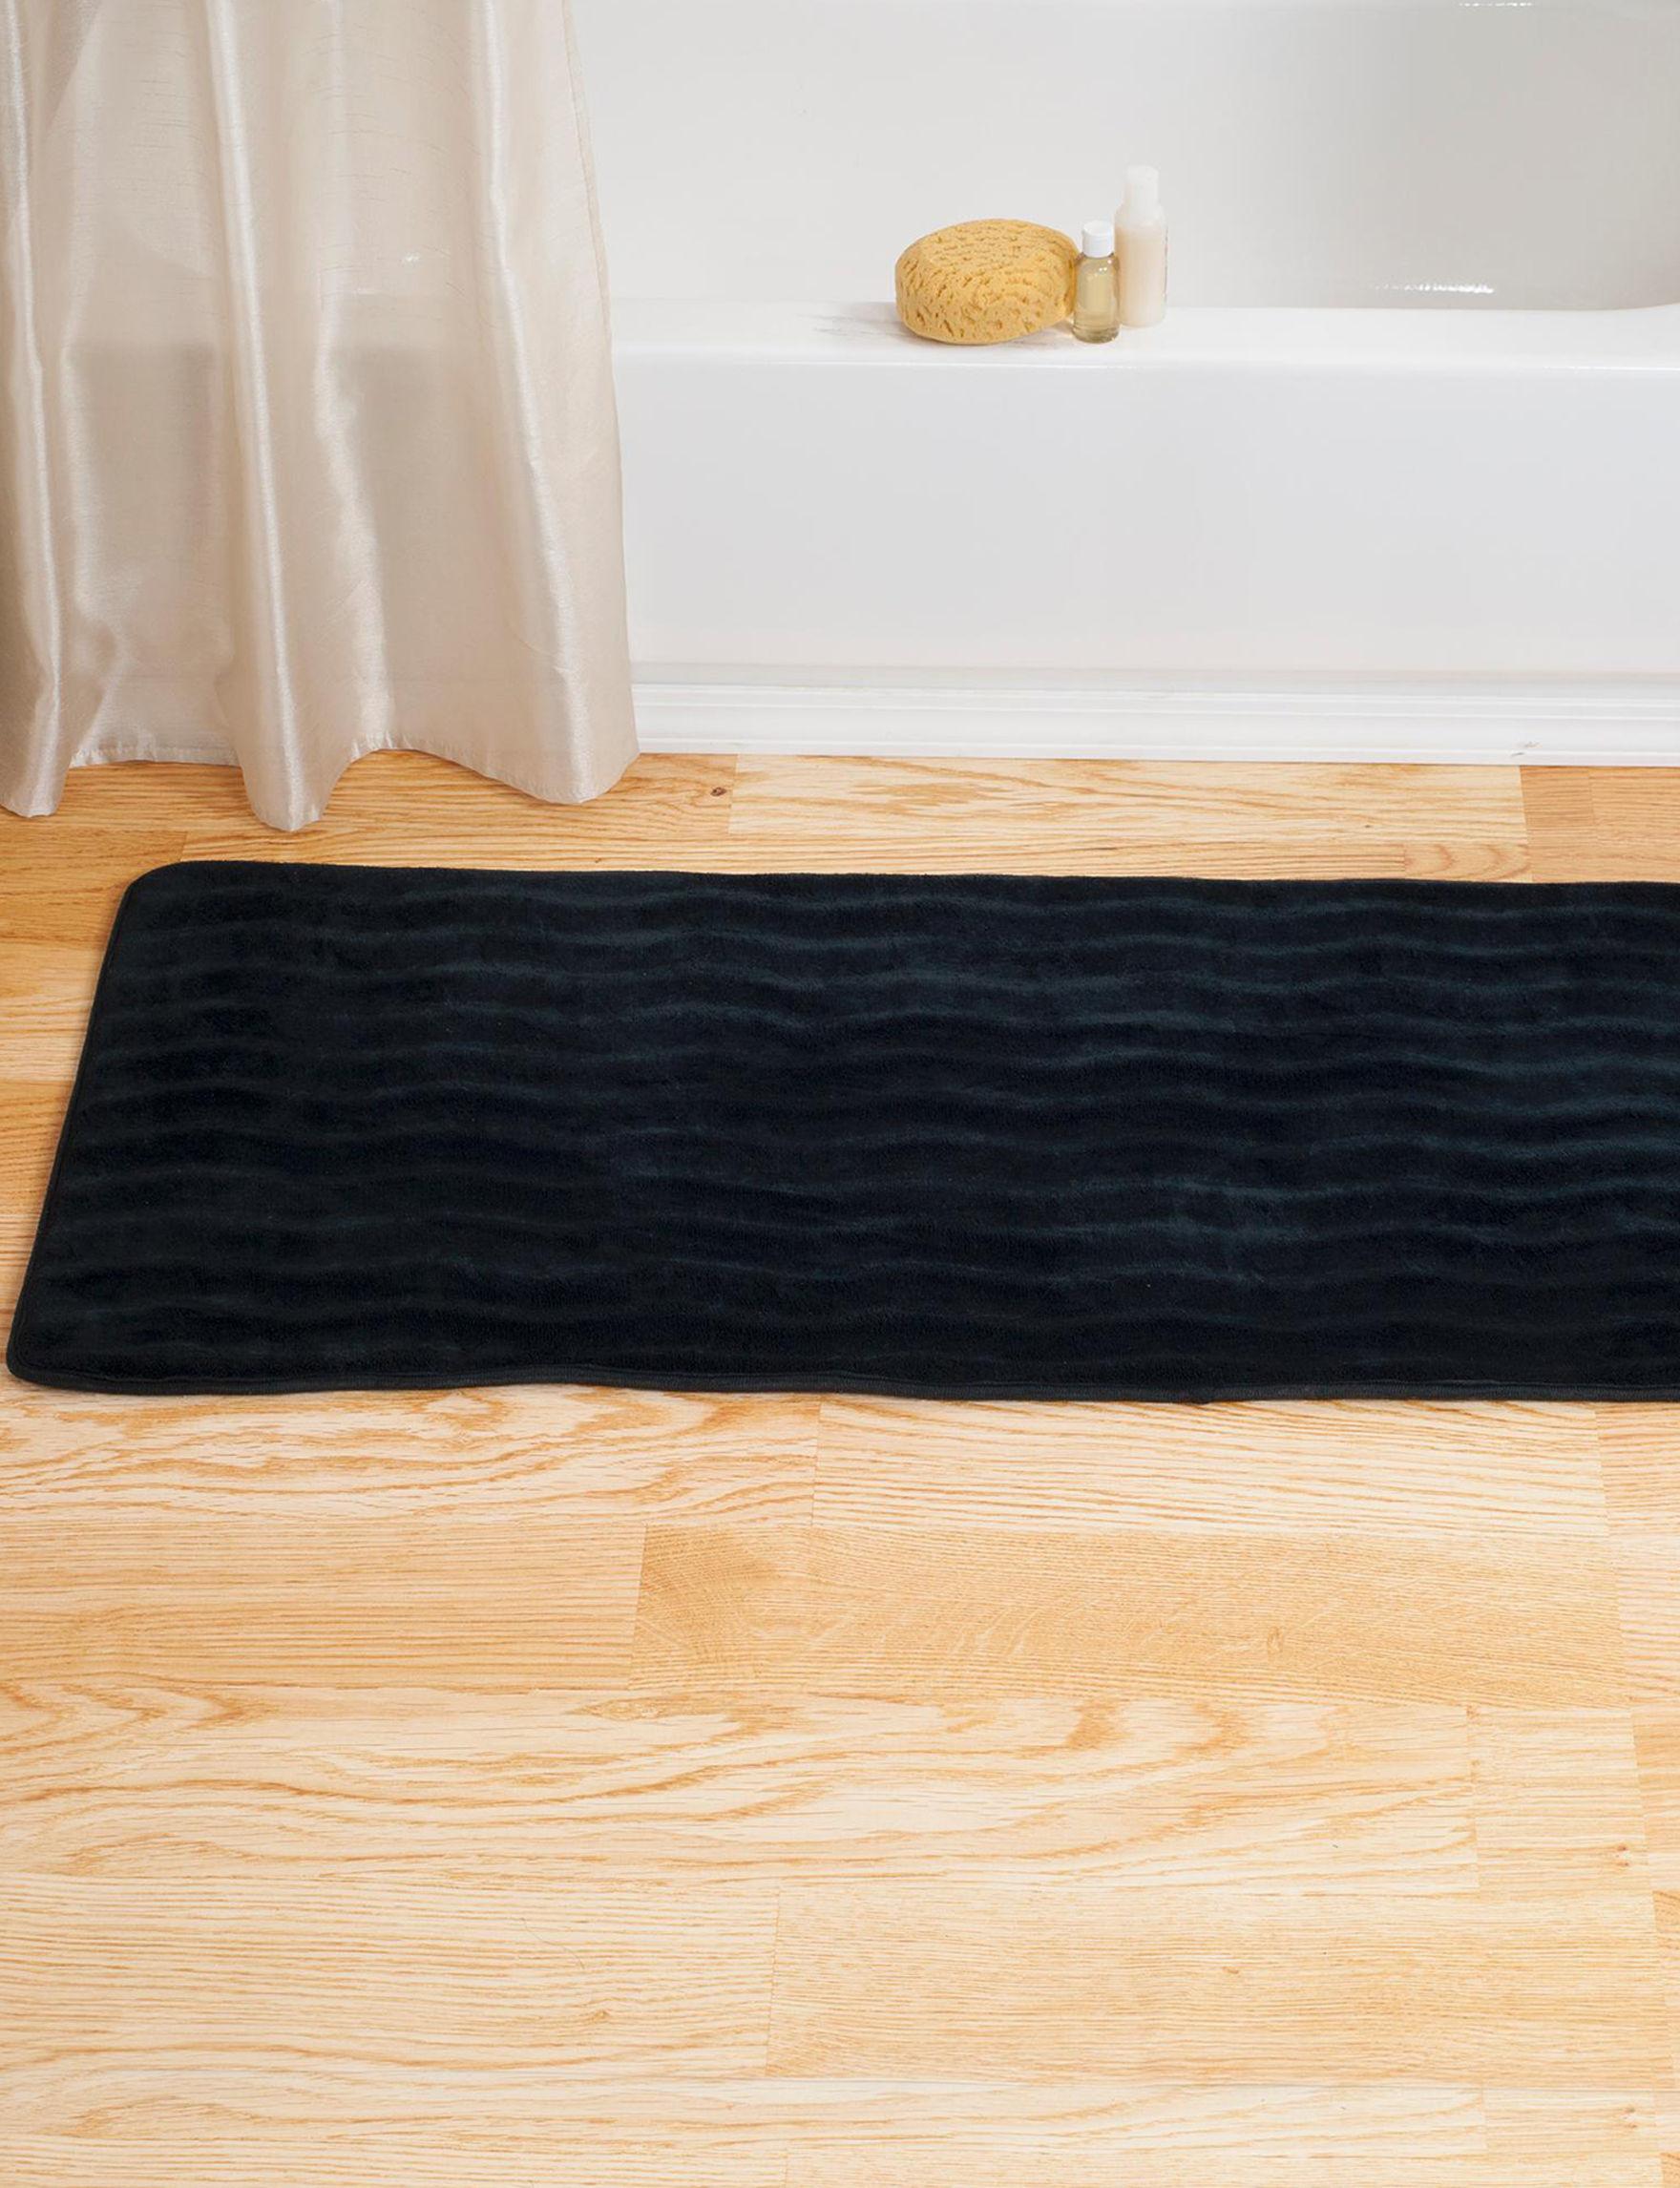 Lavish Home Black Area Rugs Bath Rugs & Mats